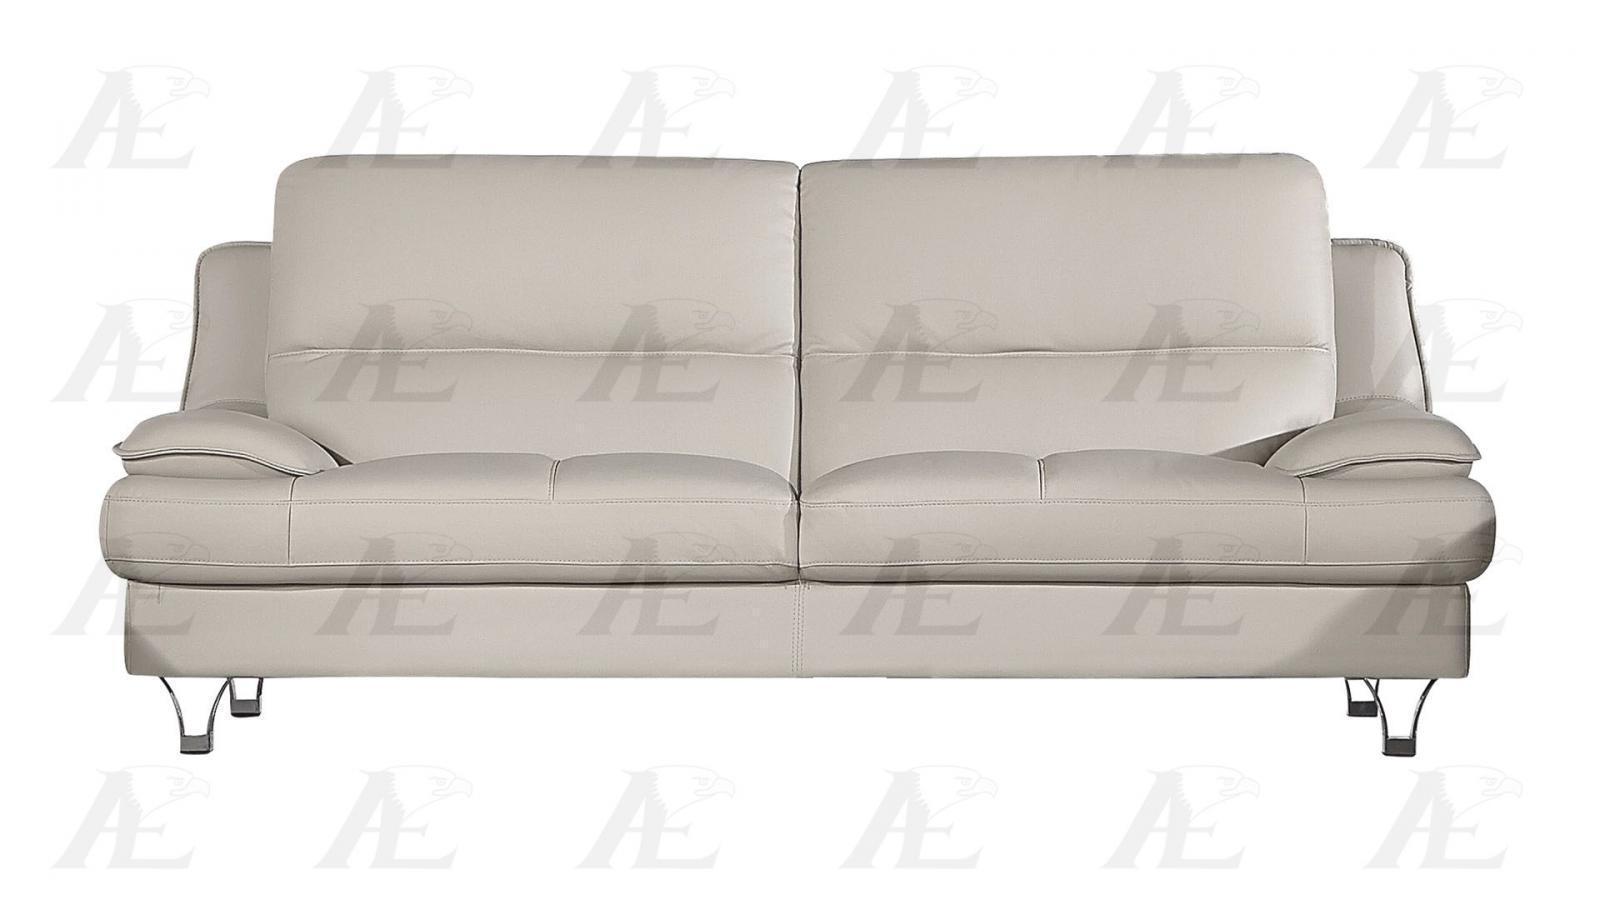 American eagle ek b109 modern light gray genuine leather for Gray leather sofa set